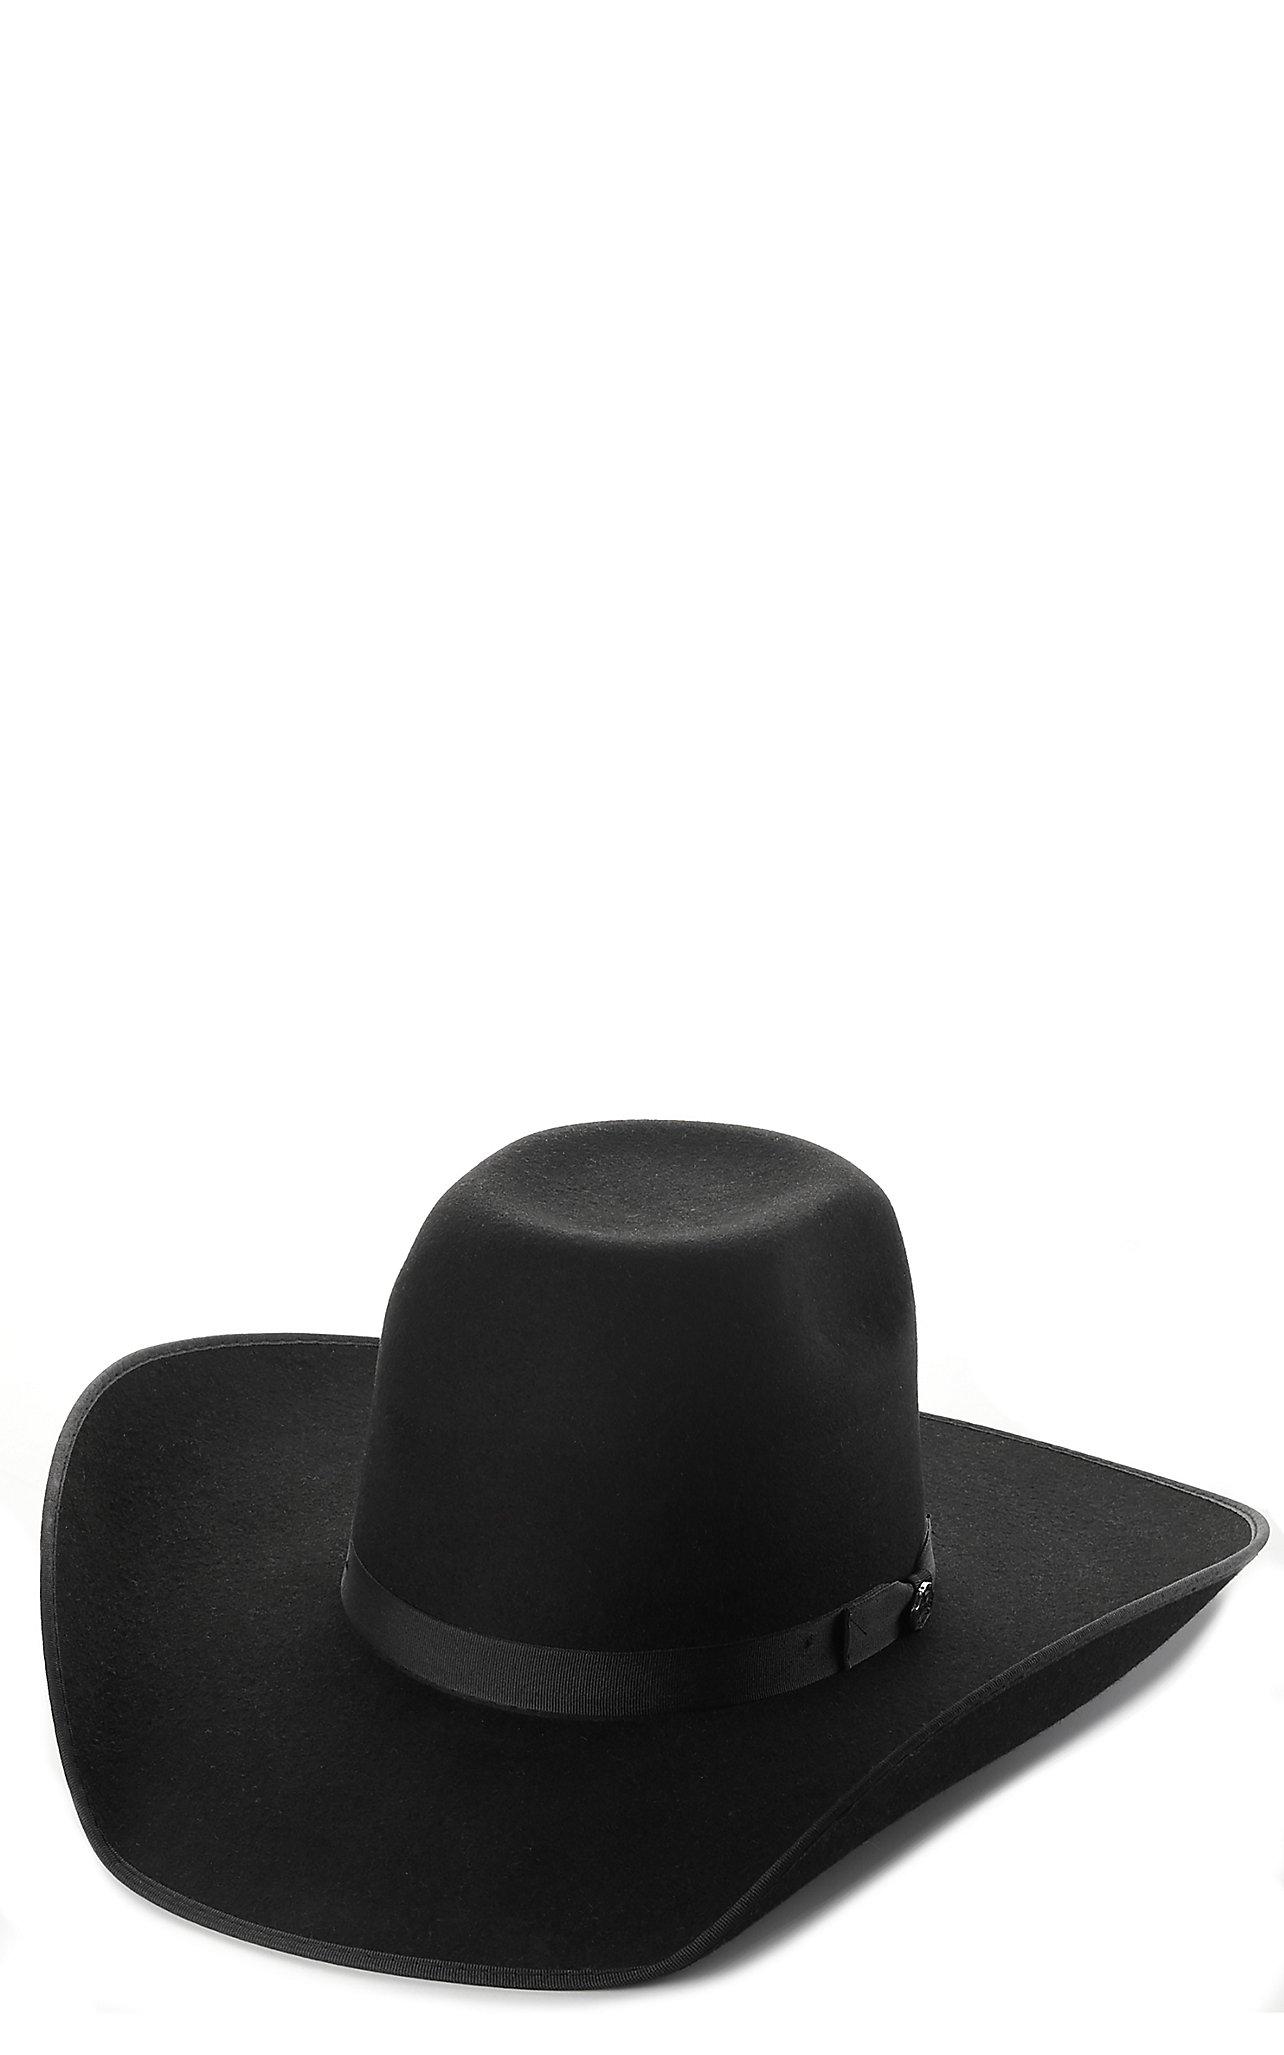 Cavender s Cowboy Collection 3X Black Bull Rider Crown Premium Wool Cowboy  Hat  40f5168ff49